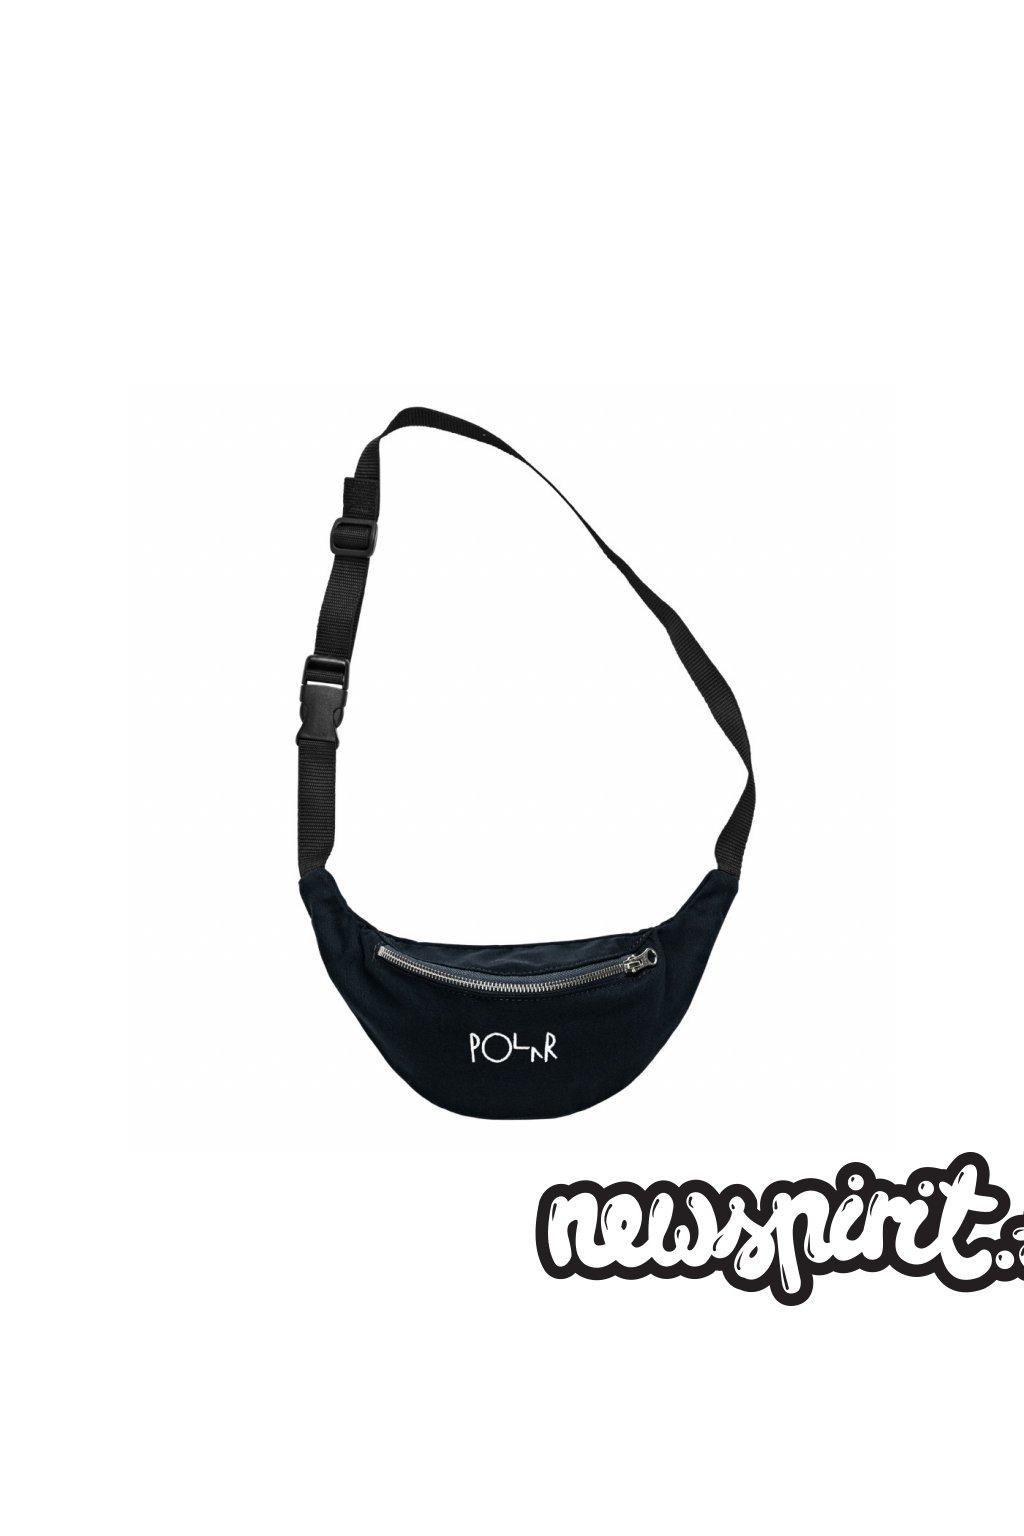 3111 3 script logo hip bag black